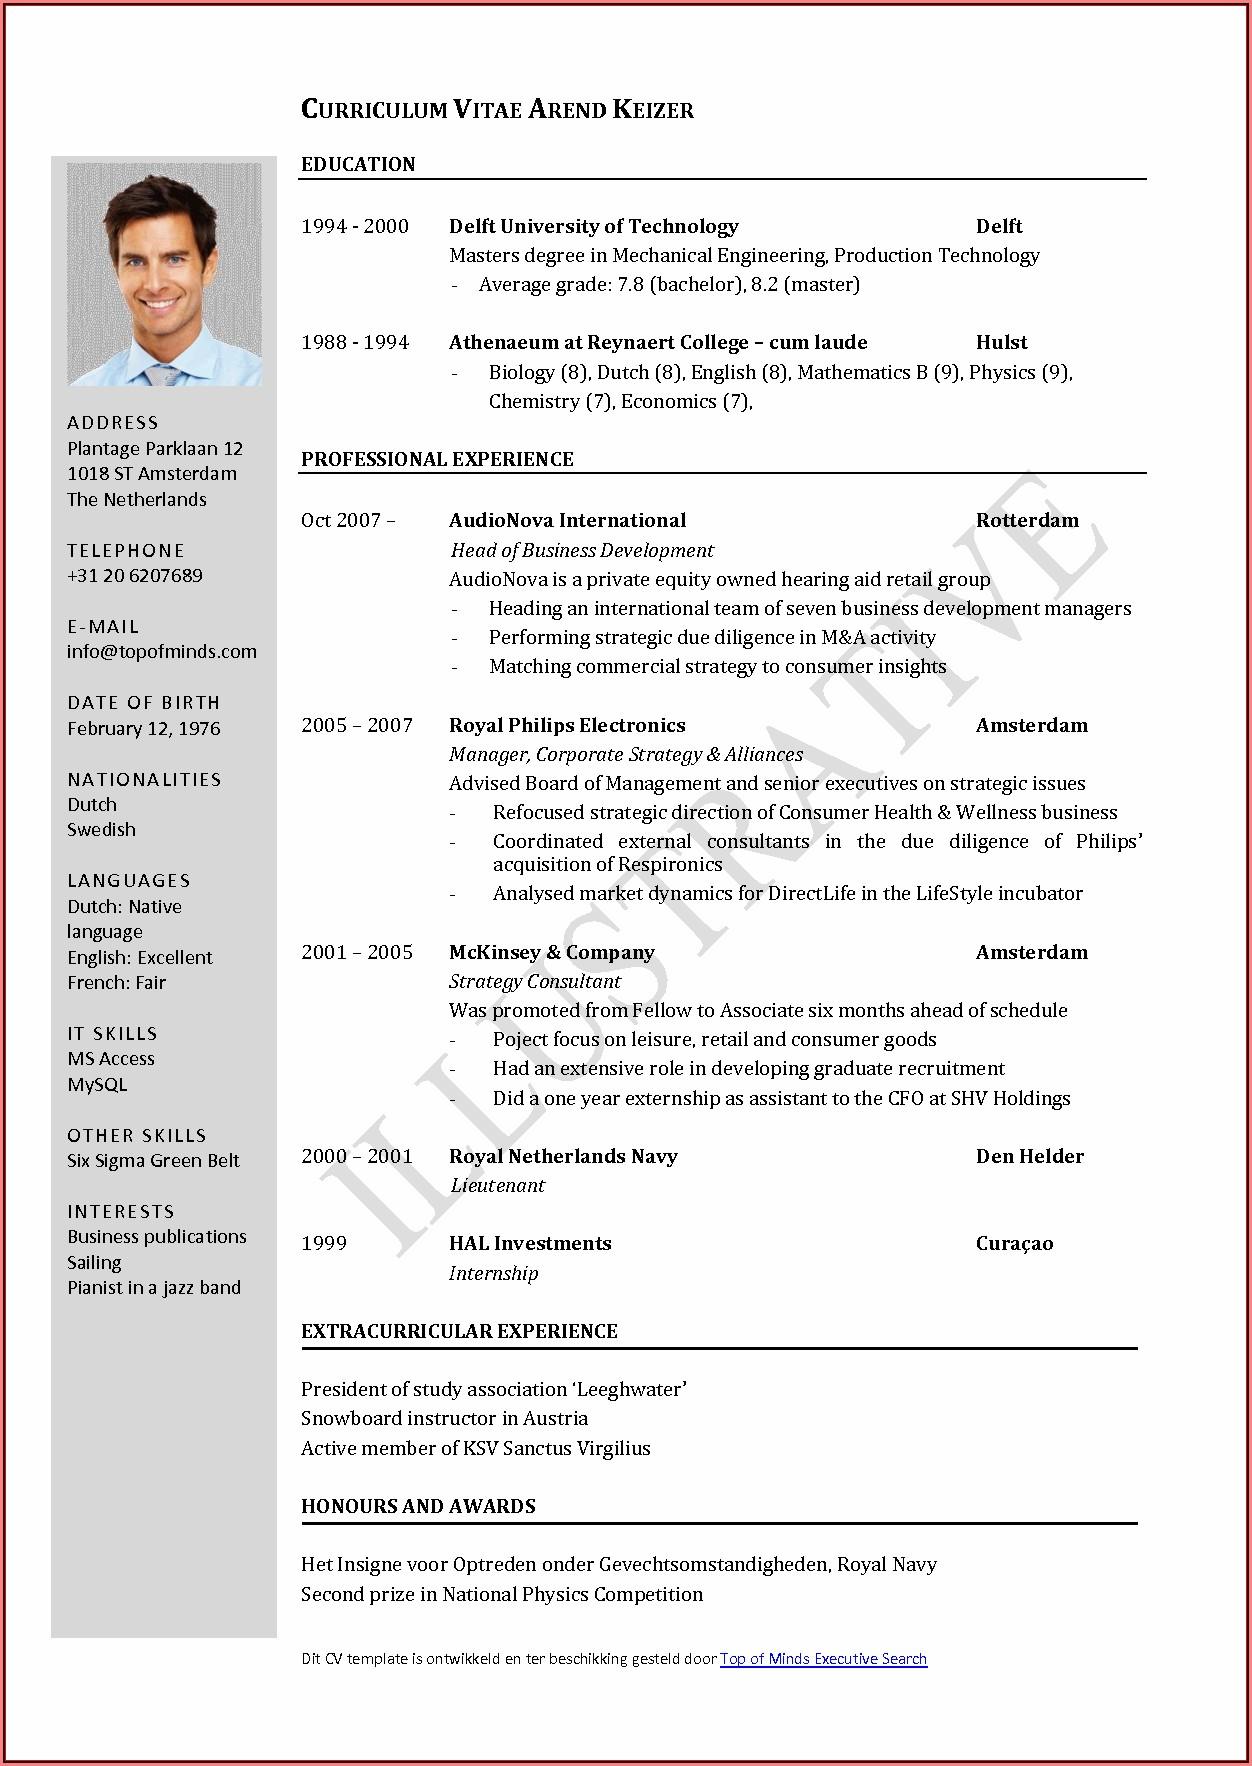 Curriculum Vitae Cv Template Free Download